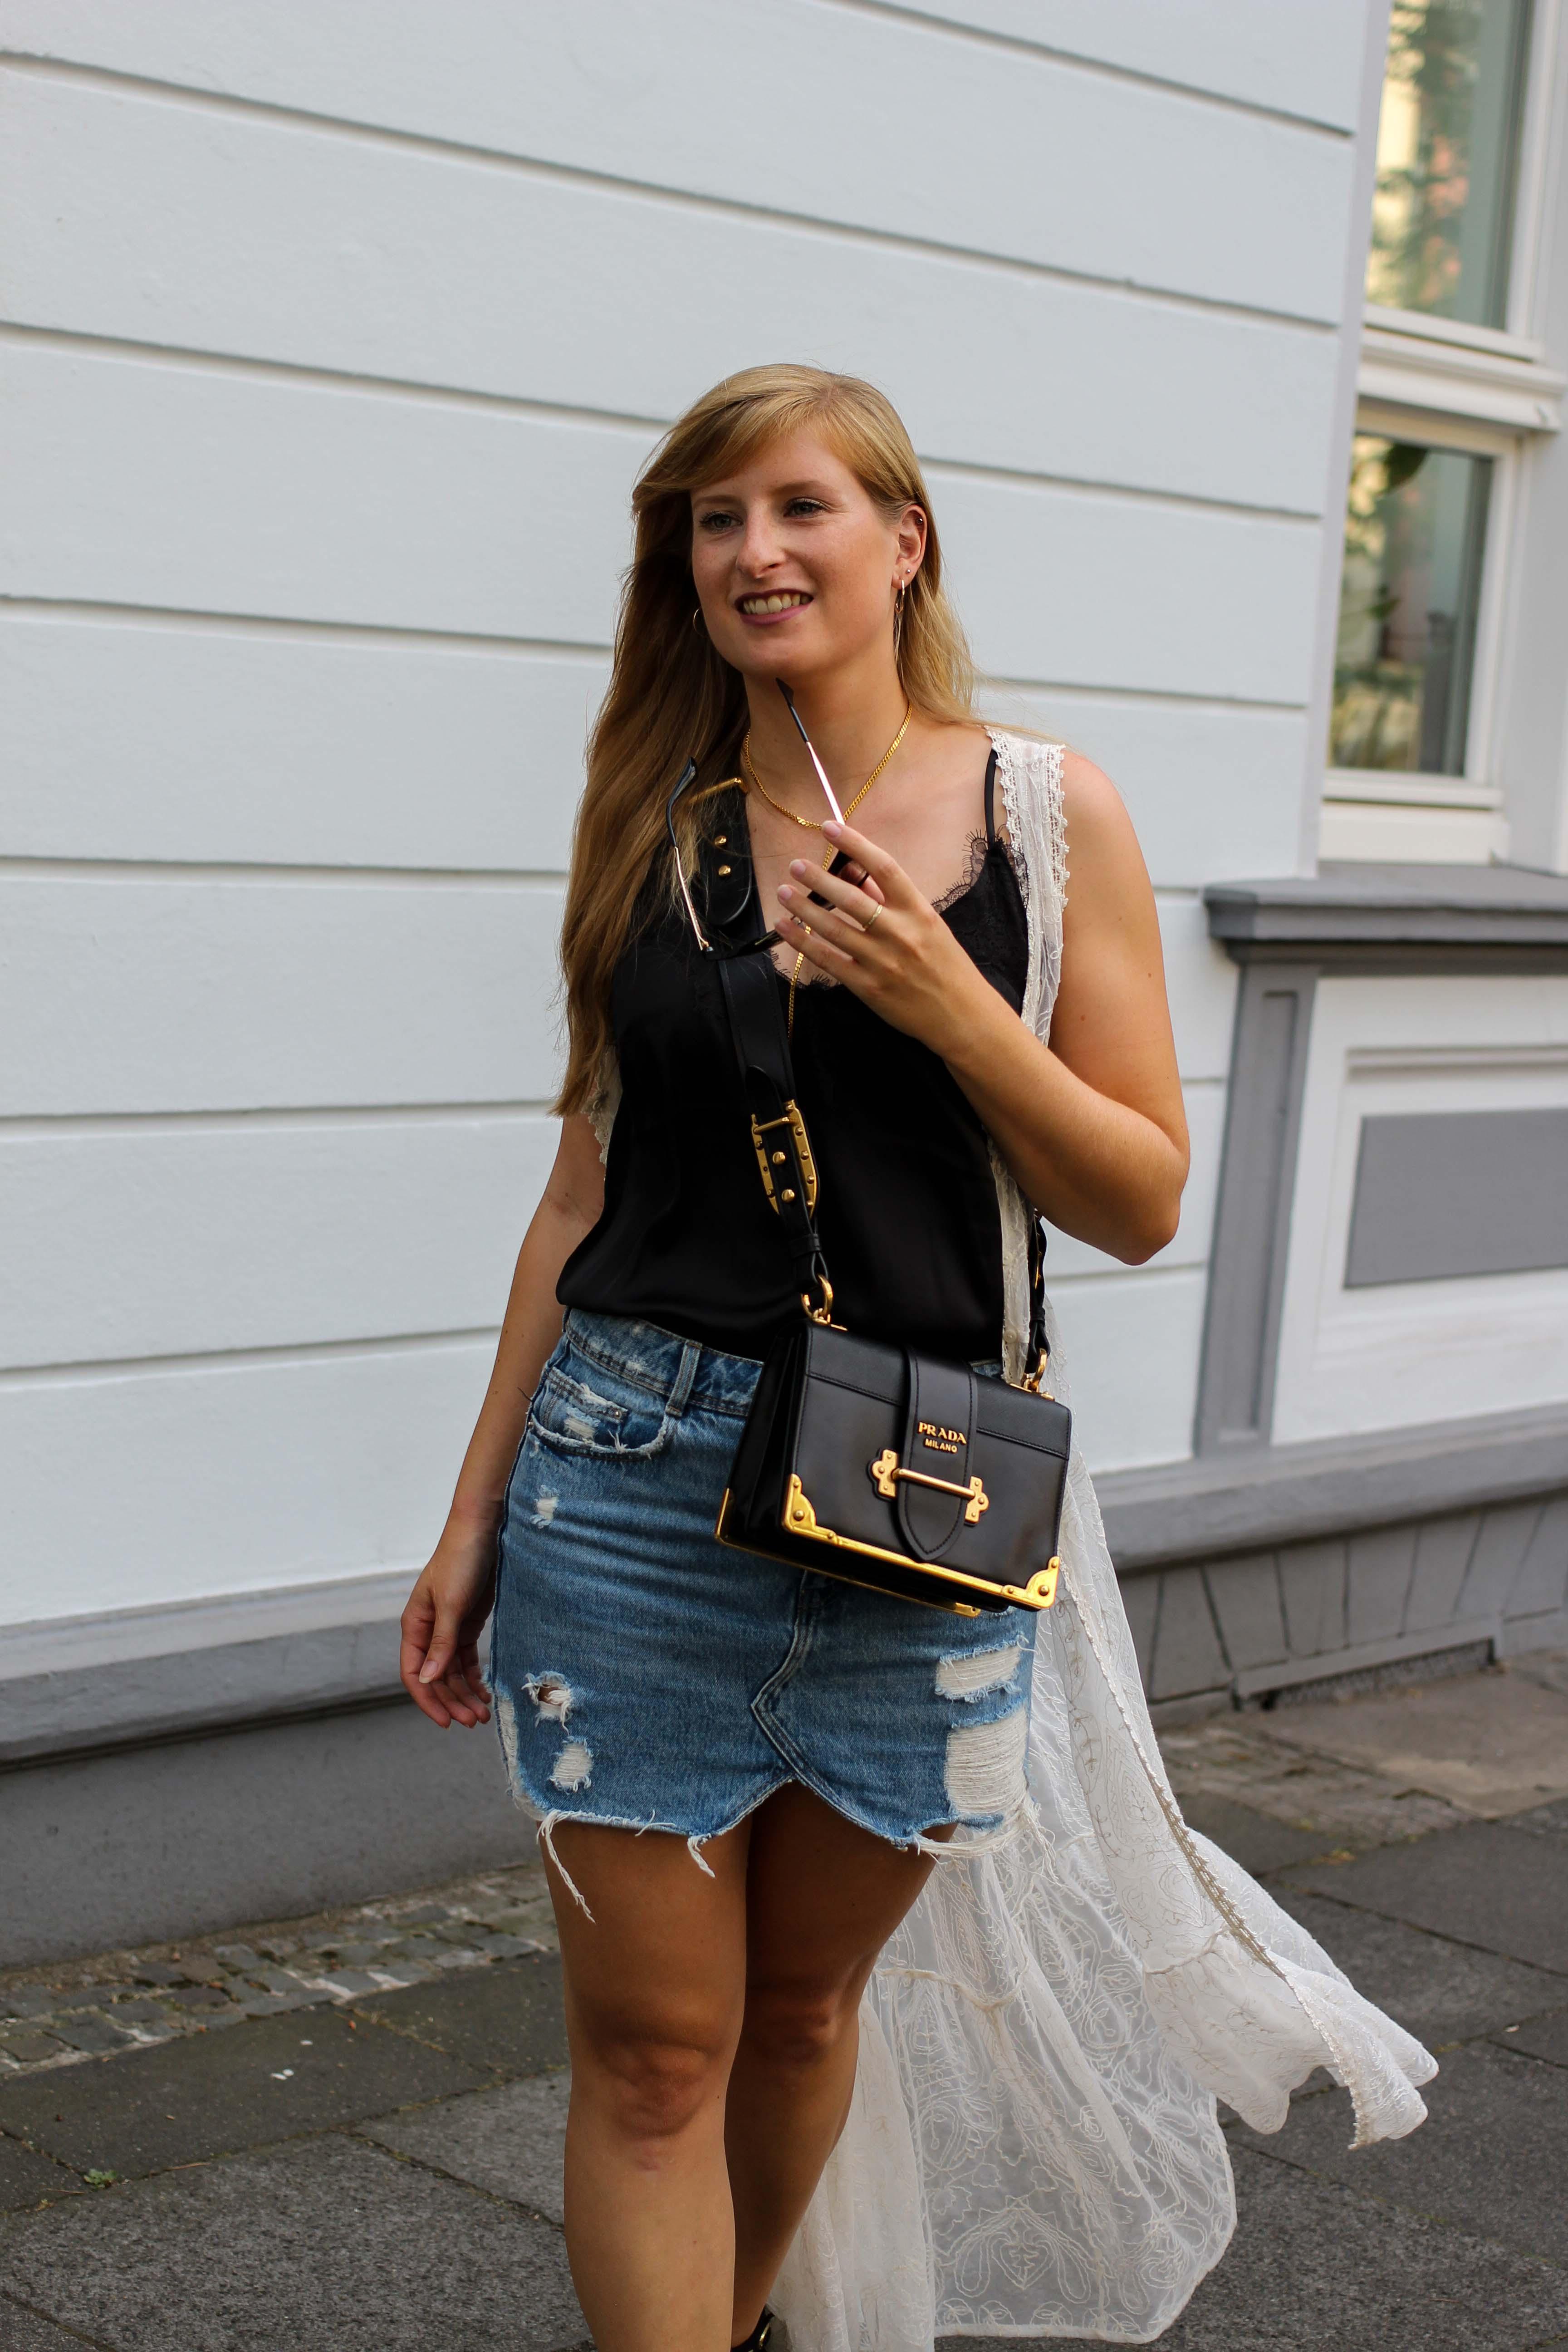 Spitzentop Jeansrock Boho Sommermantel Boho Sommerlook kombinieren Ibiza Style Hippie Modeblog Outfit Prada Cahier Schwarz Gold 5